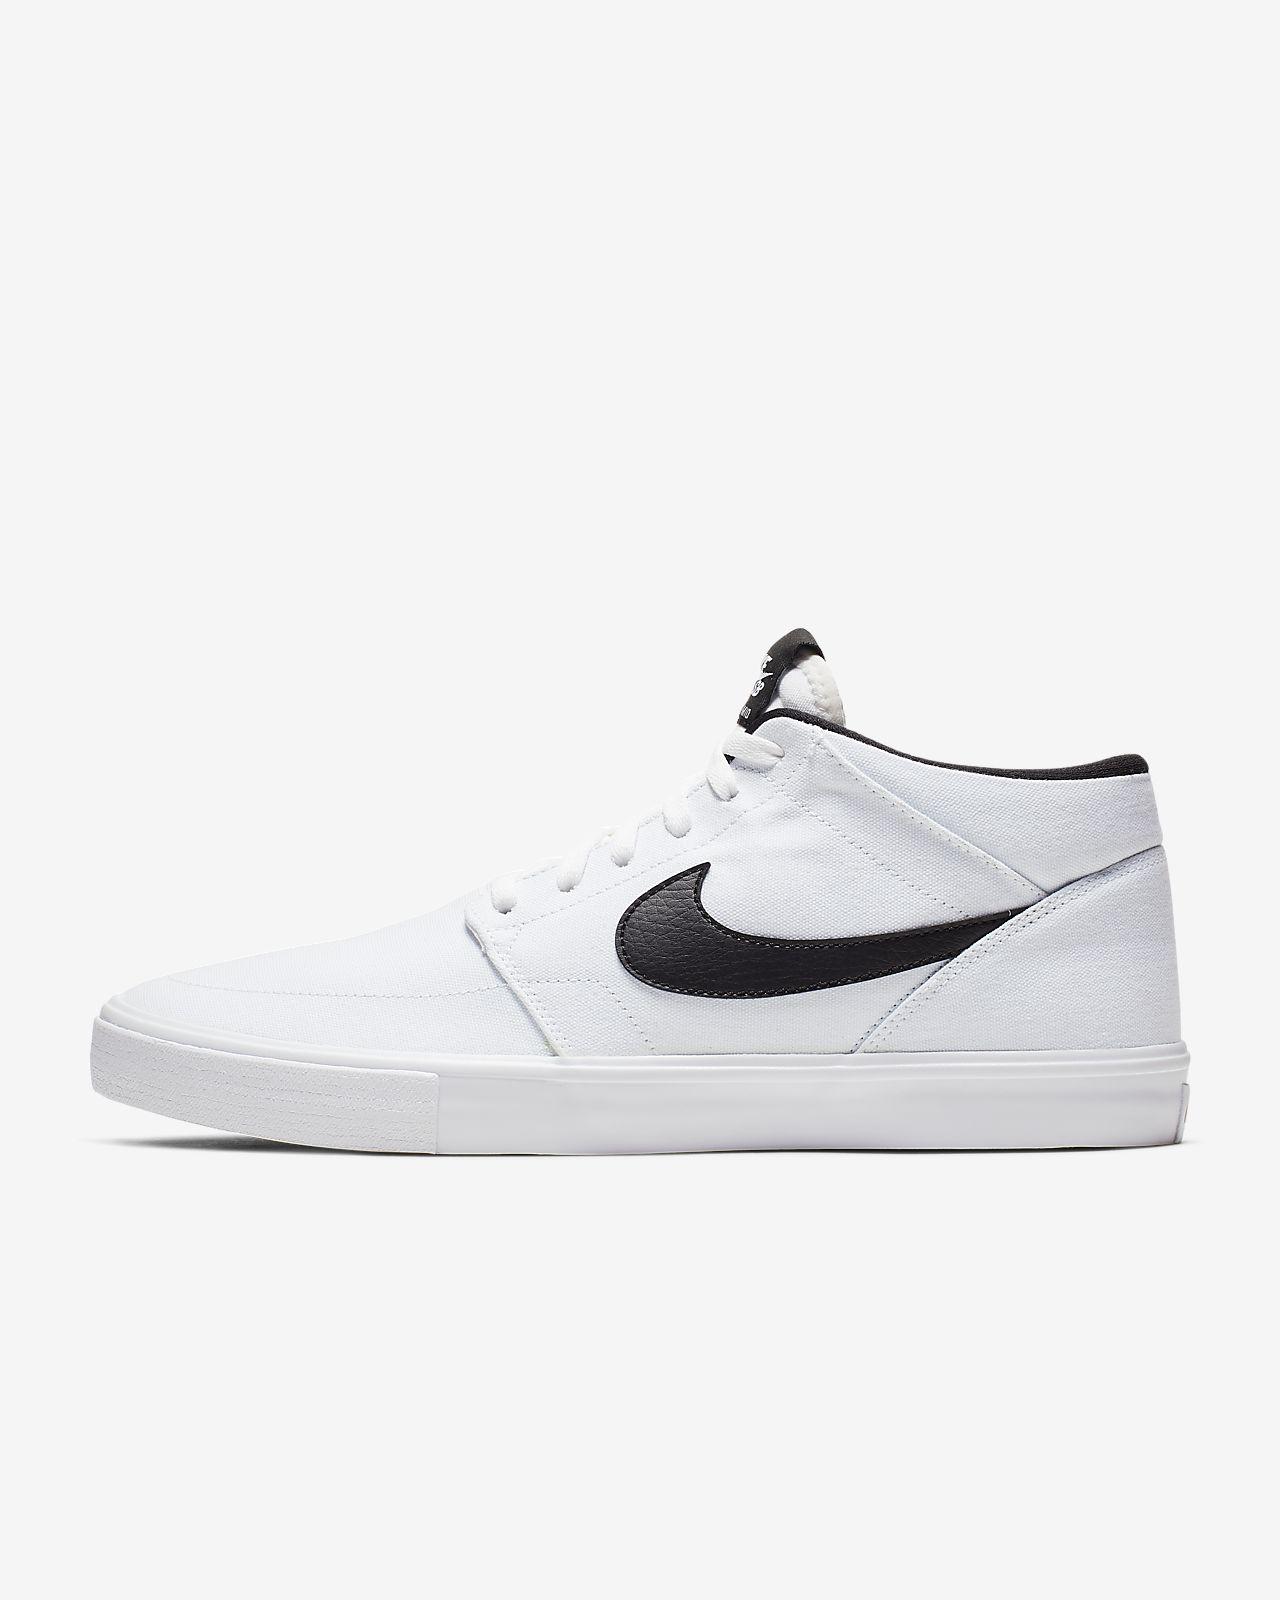 Nike SB Portmore 2 Solarsoft Mid Canvas Men's Skate Shoe